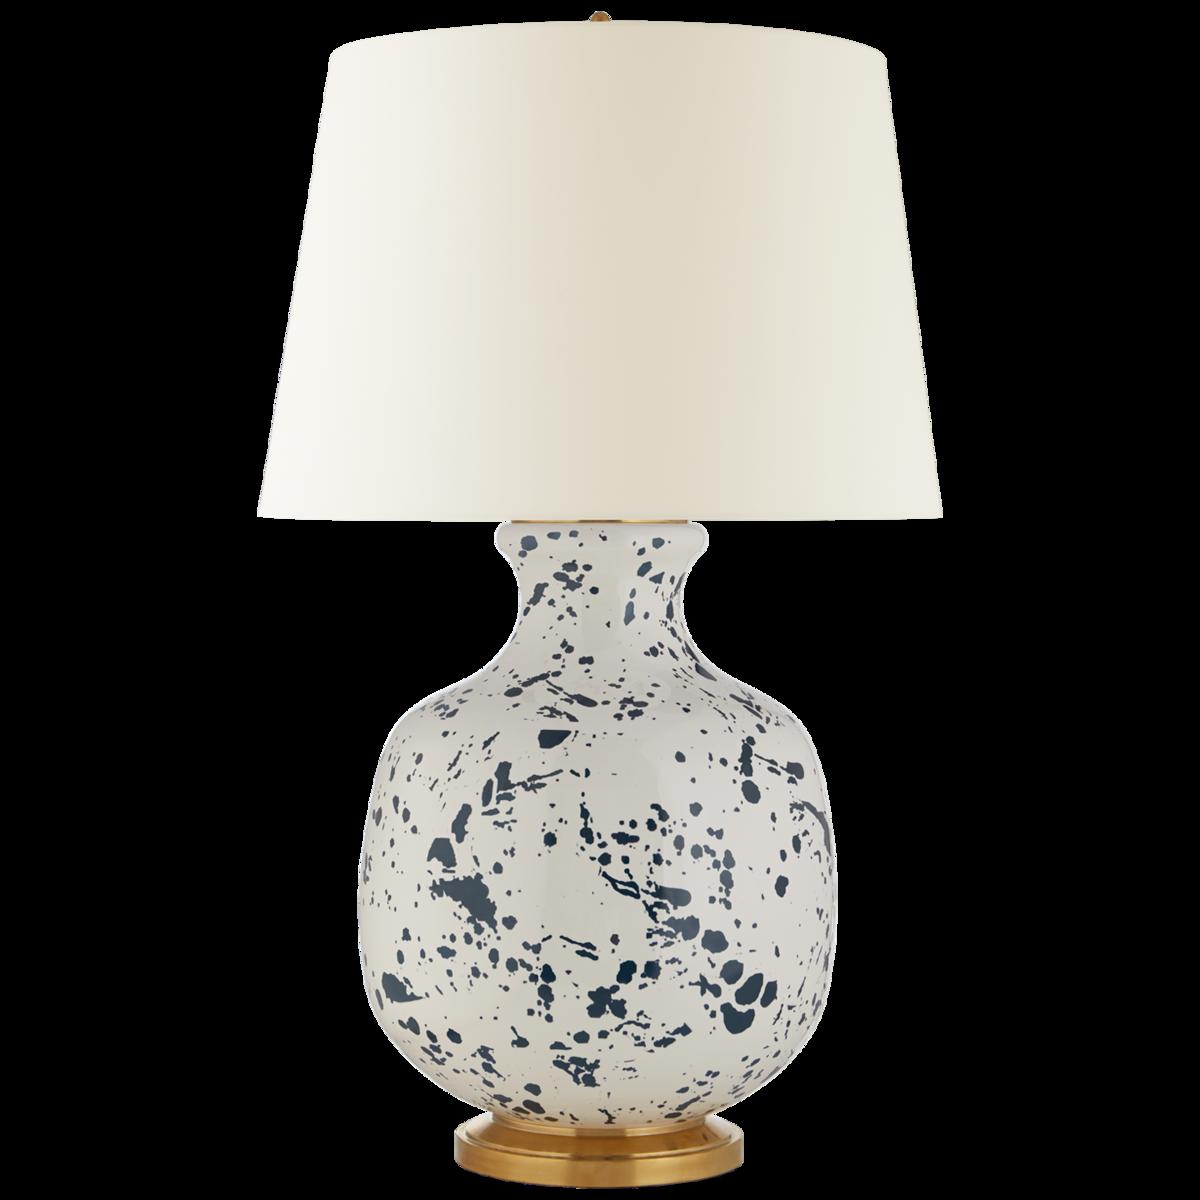 Buatta Large Table Lamp